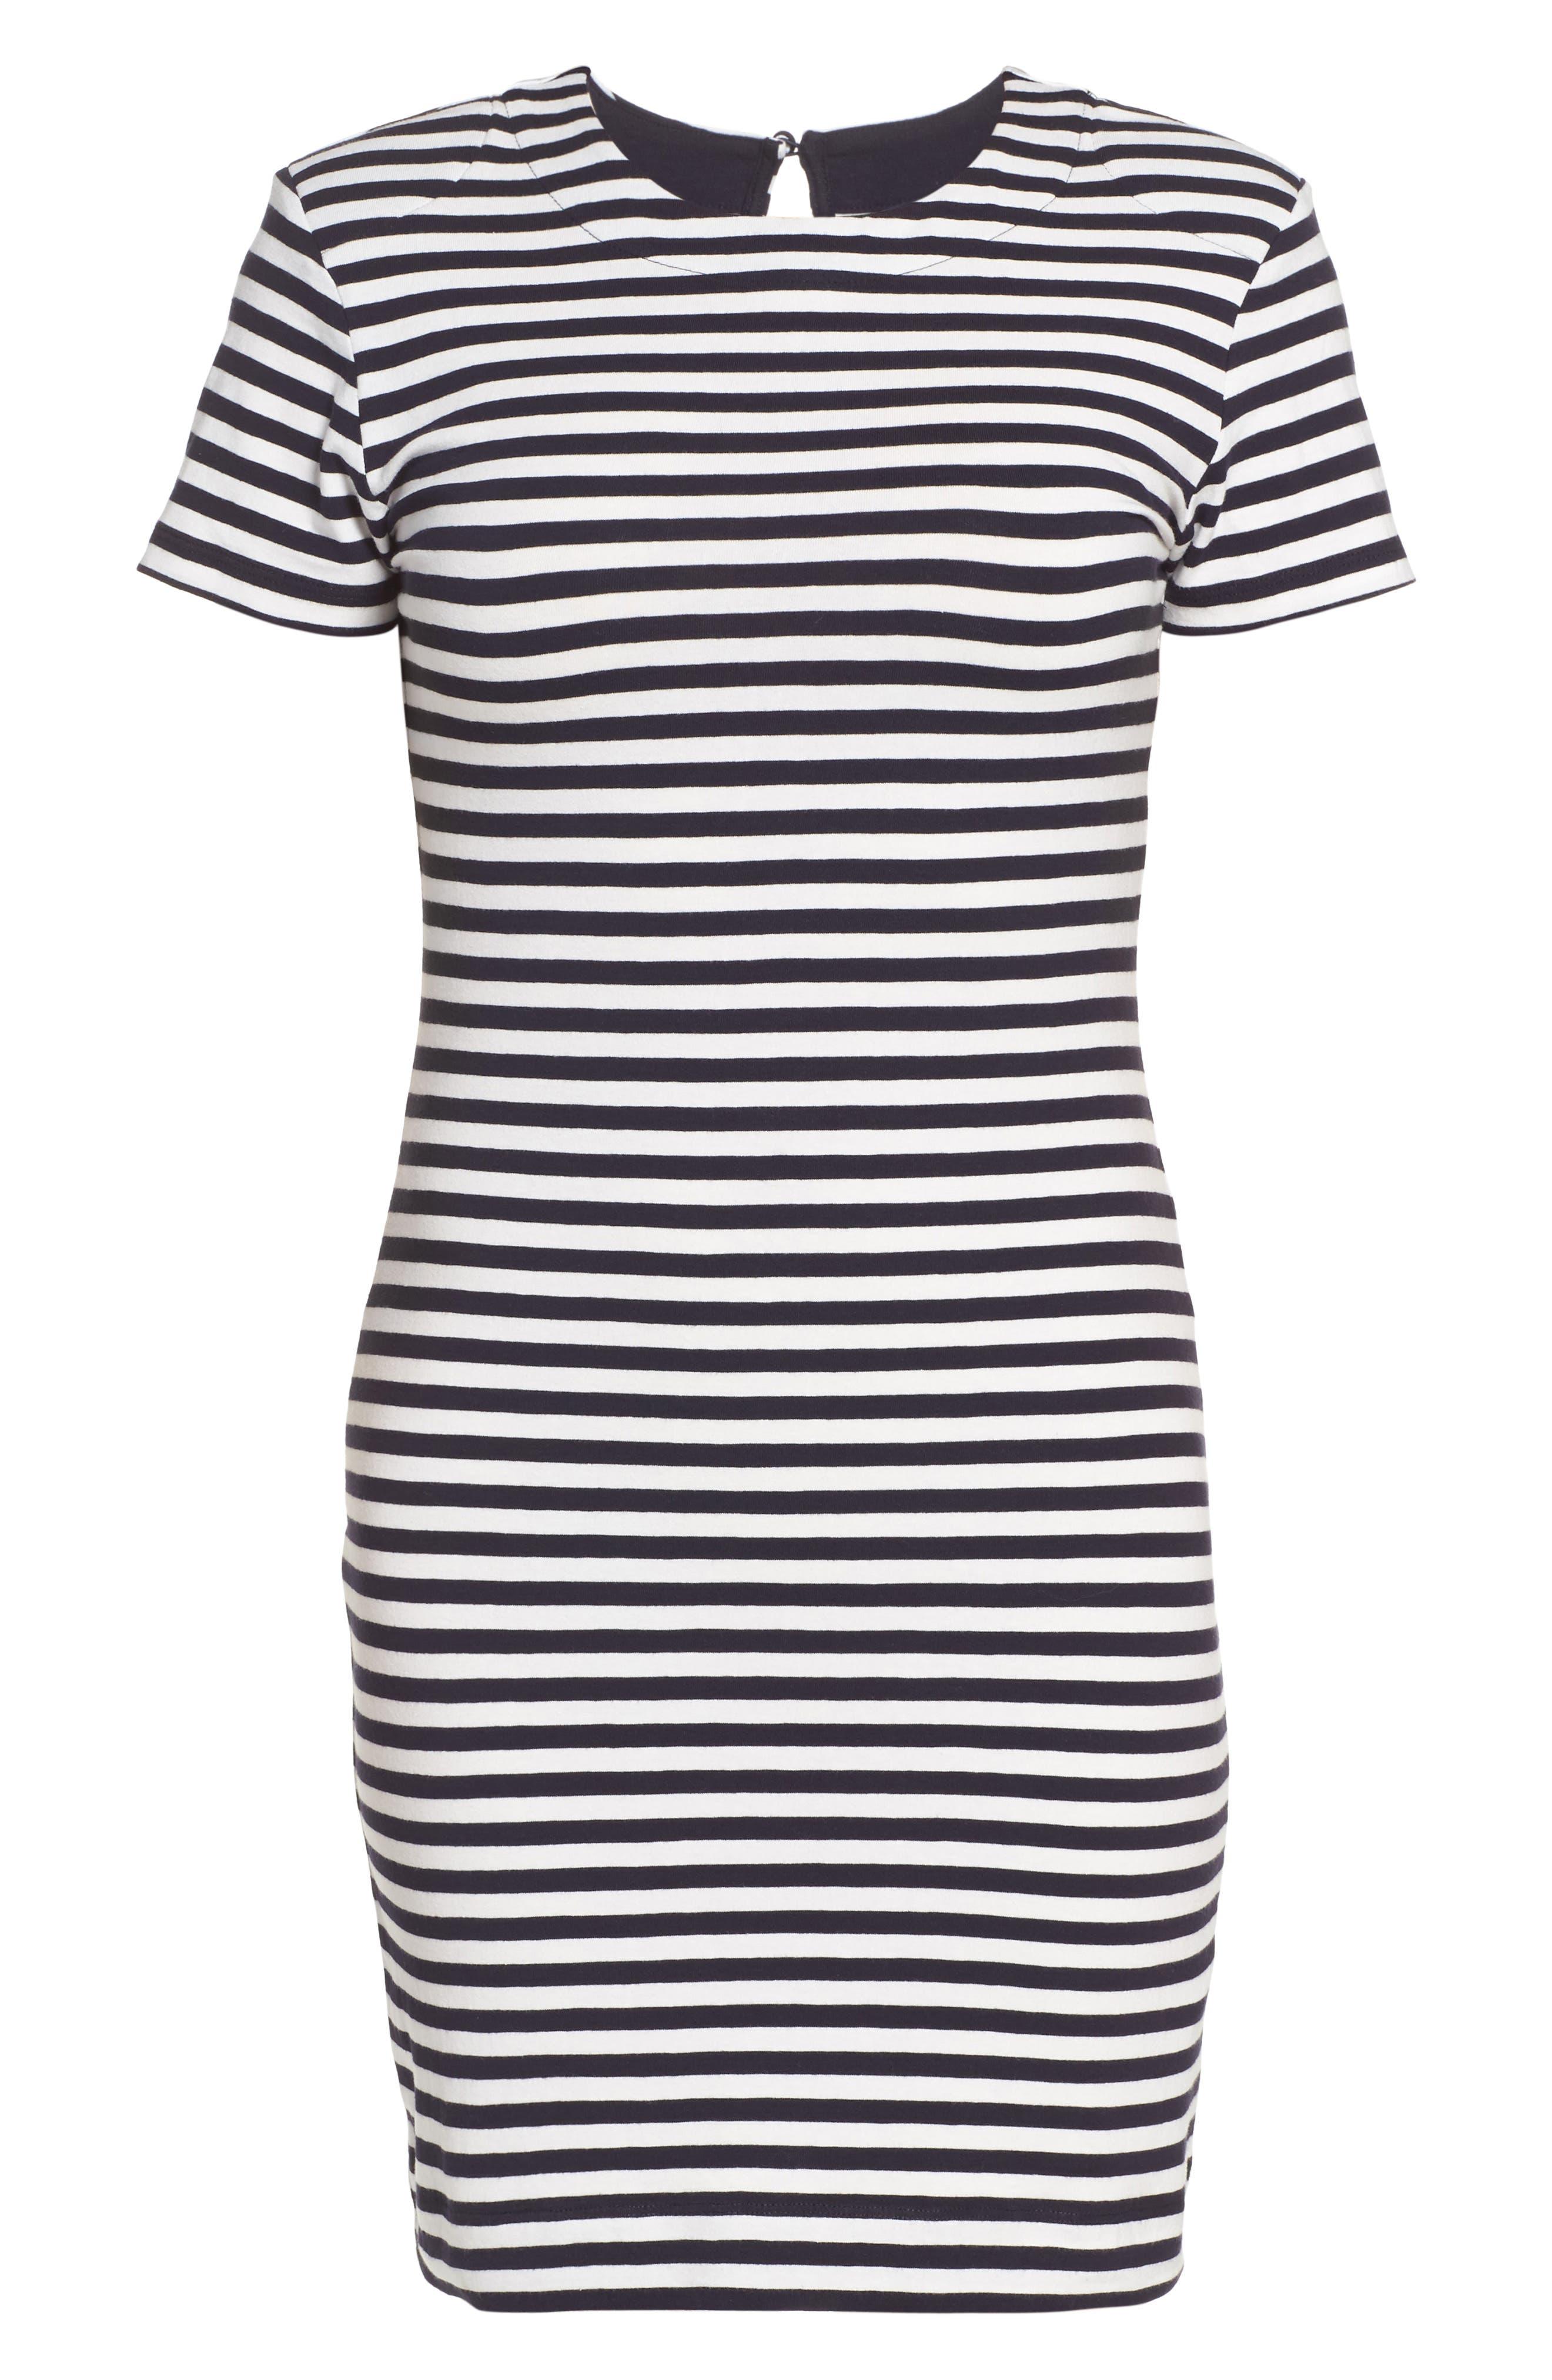 Sienna Knit Dress,                             Alternate thumbnail 6, color,                             493